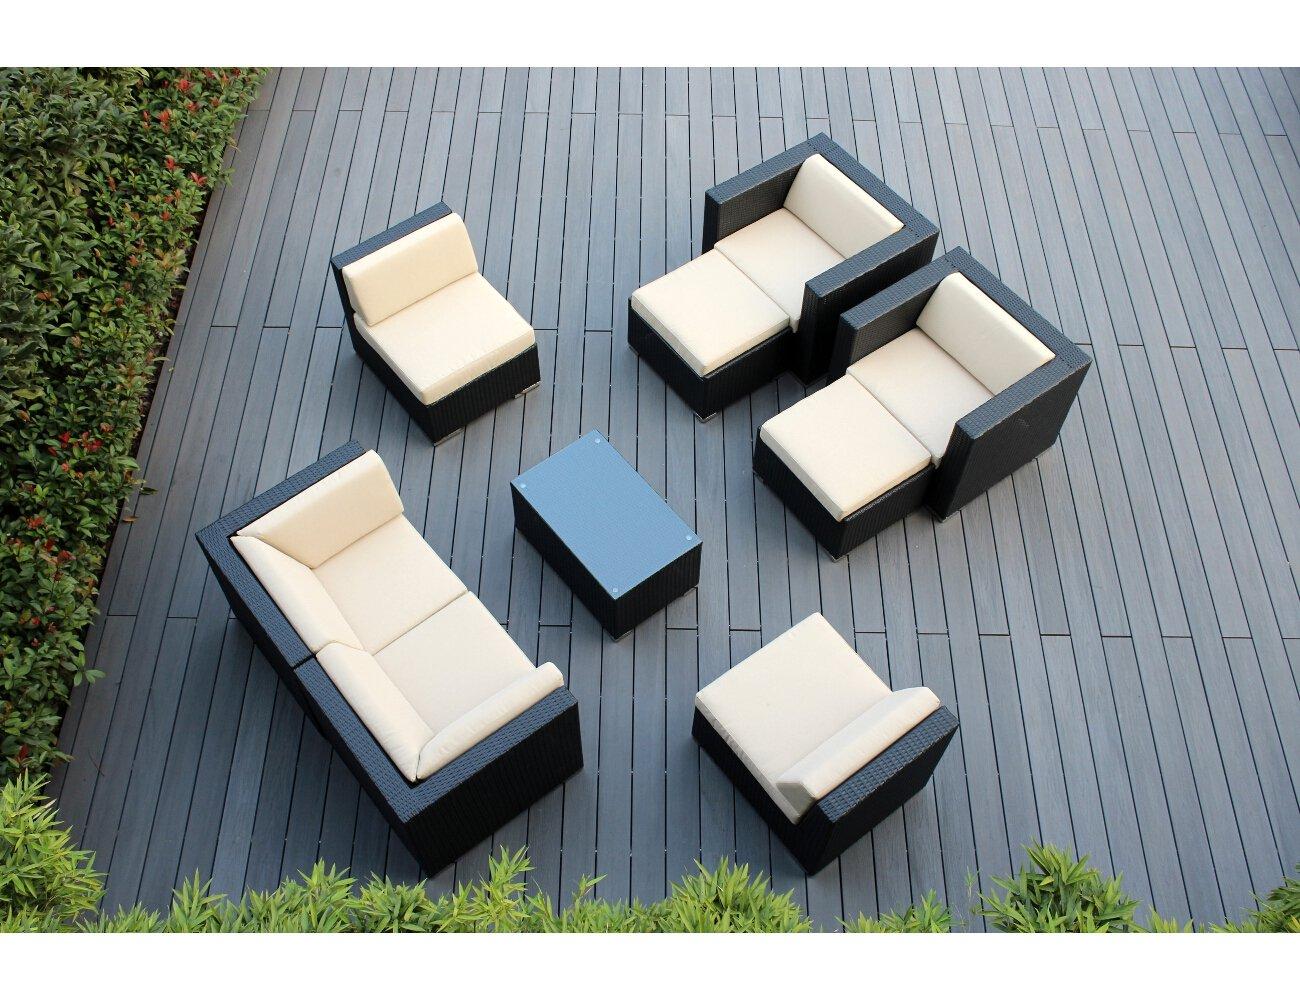 Amazon.com: Ohana 9 Piece Outdoor Wicker Patio Furniture Sectional  Conversation Set With Weather Resistant Cushions, Beige (PN0910): Garden U0026  Outdoor